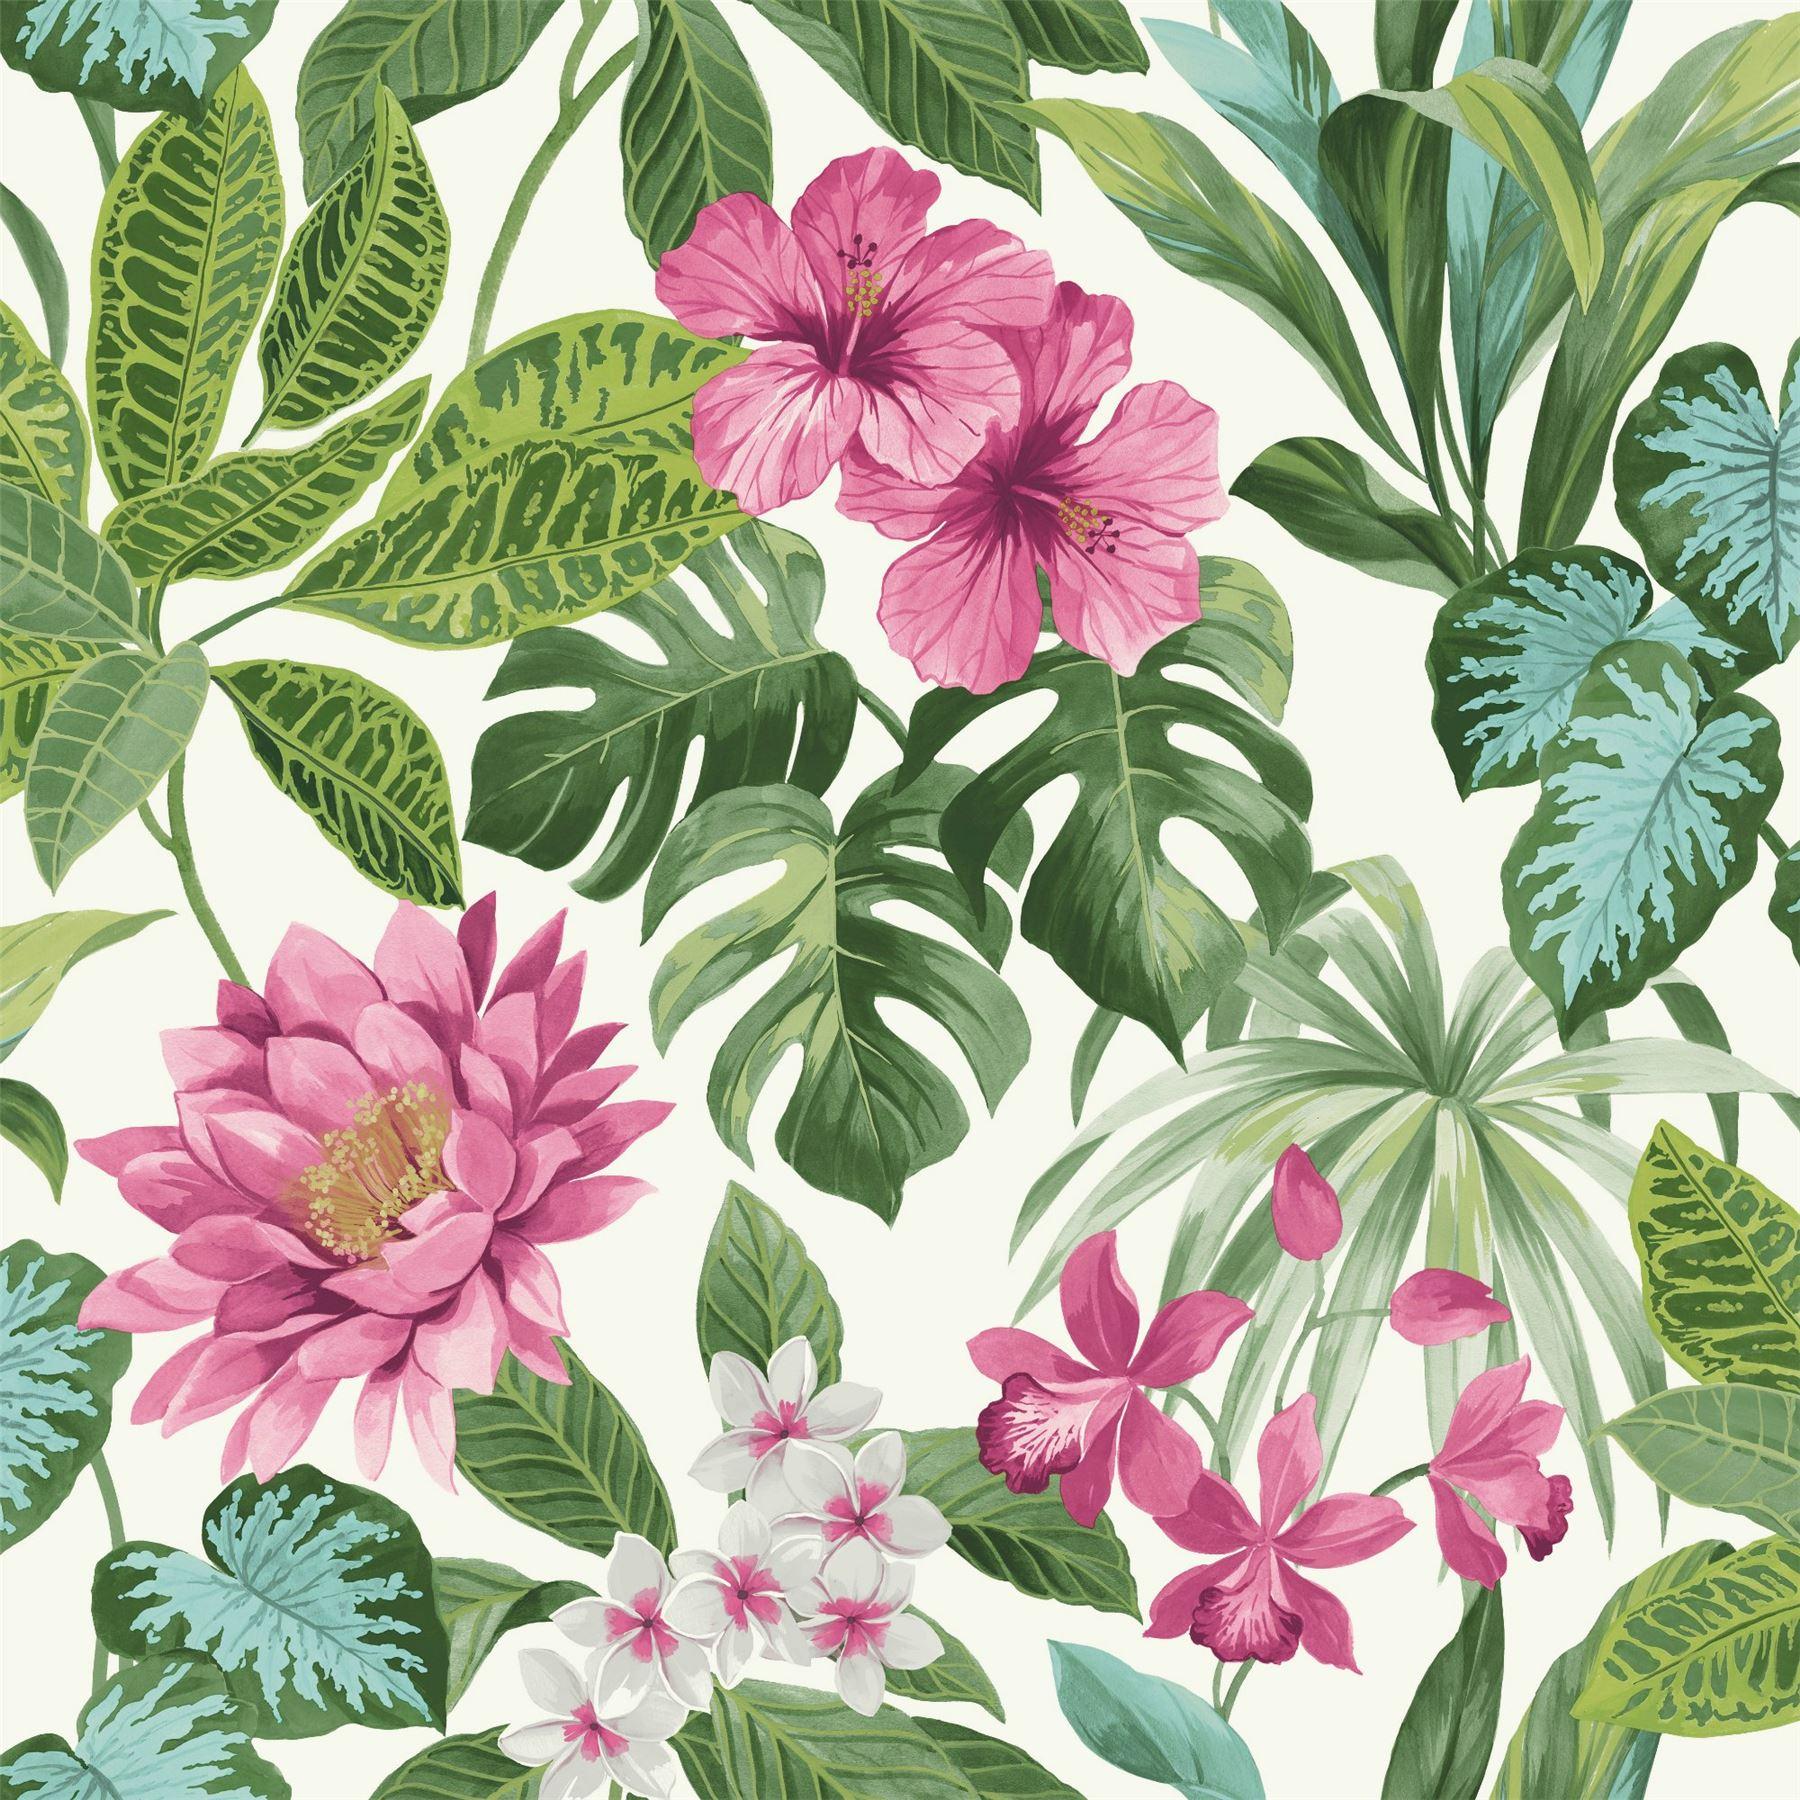 details about tropica rainforest palm leaf floral wallpaper flower green pink white fine decor